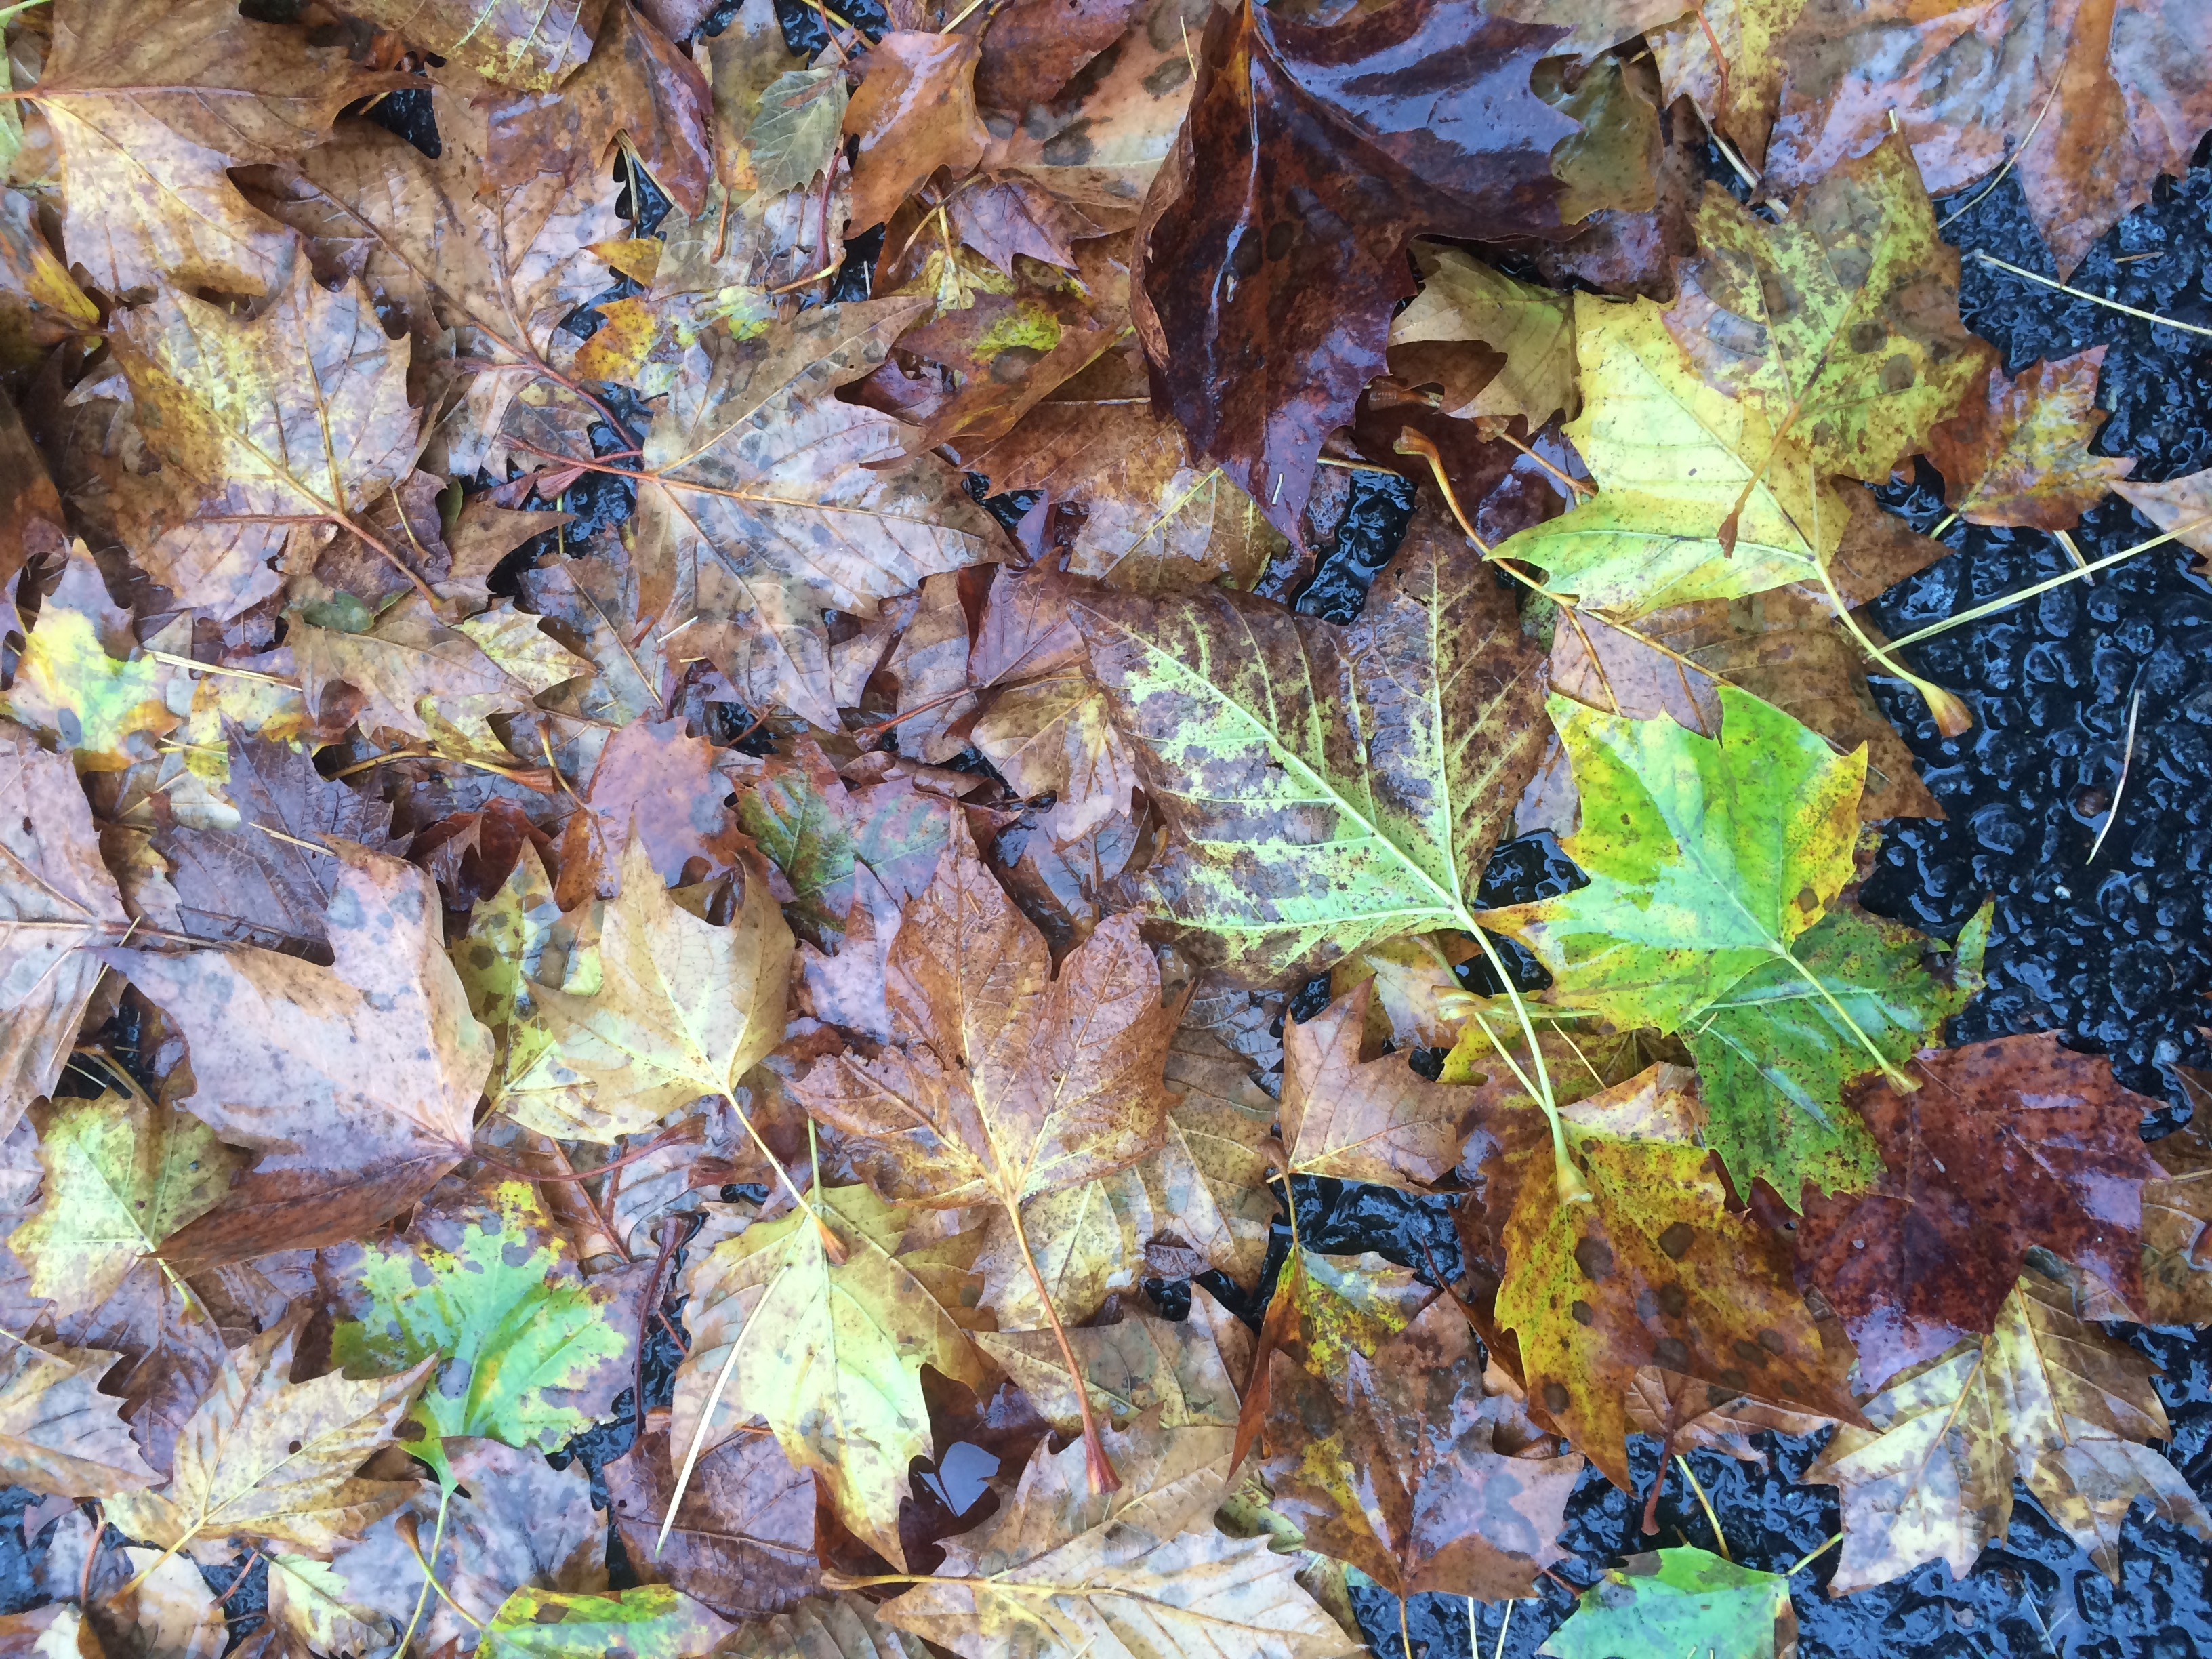 Autumn leaves: Rich, warm colors hang on through wind, rain